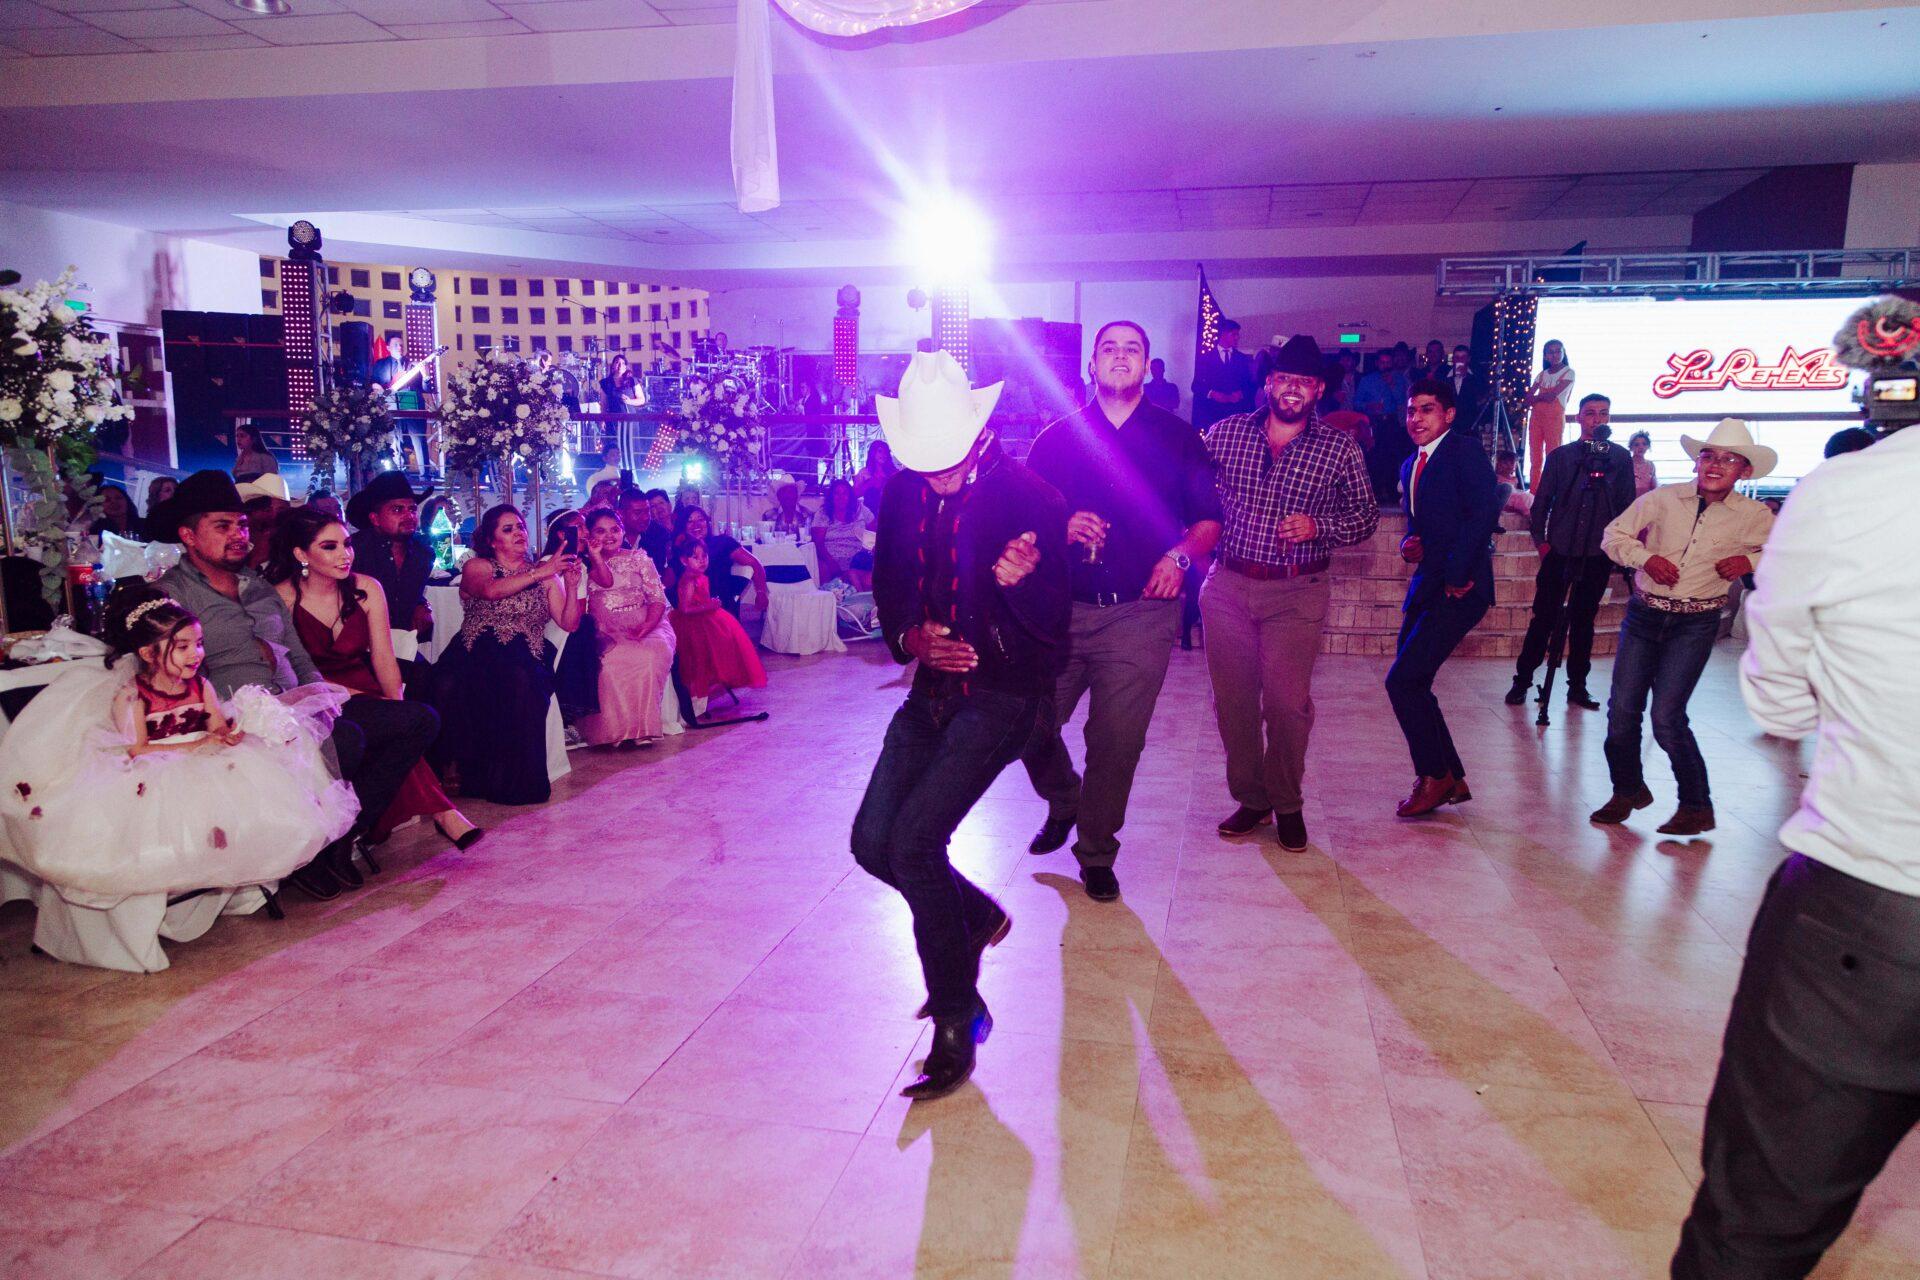 javier_noriega_fotografo_bodas_zacatecas_fresnillo_chihuahua_wedding_photographer22